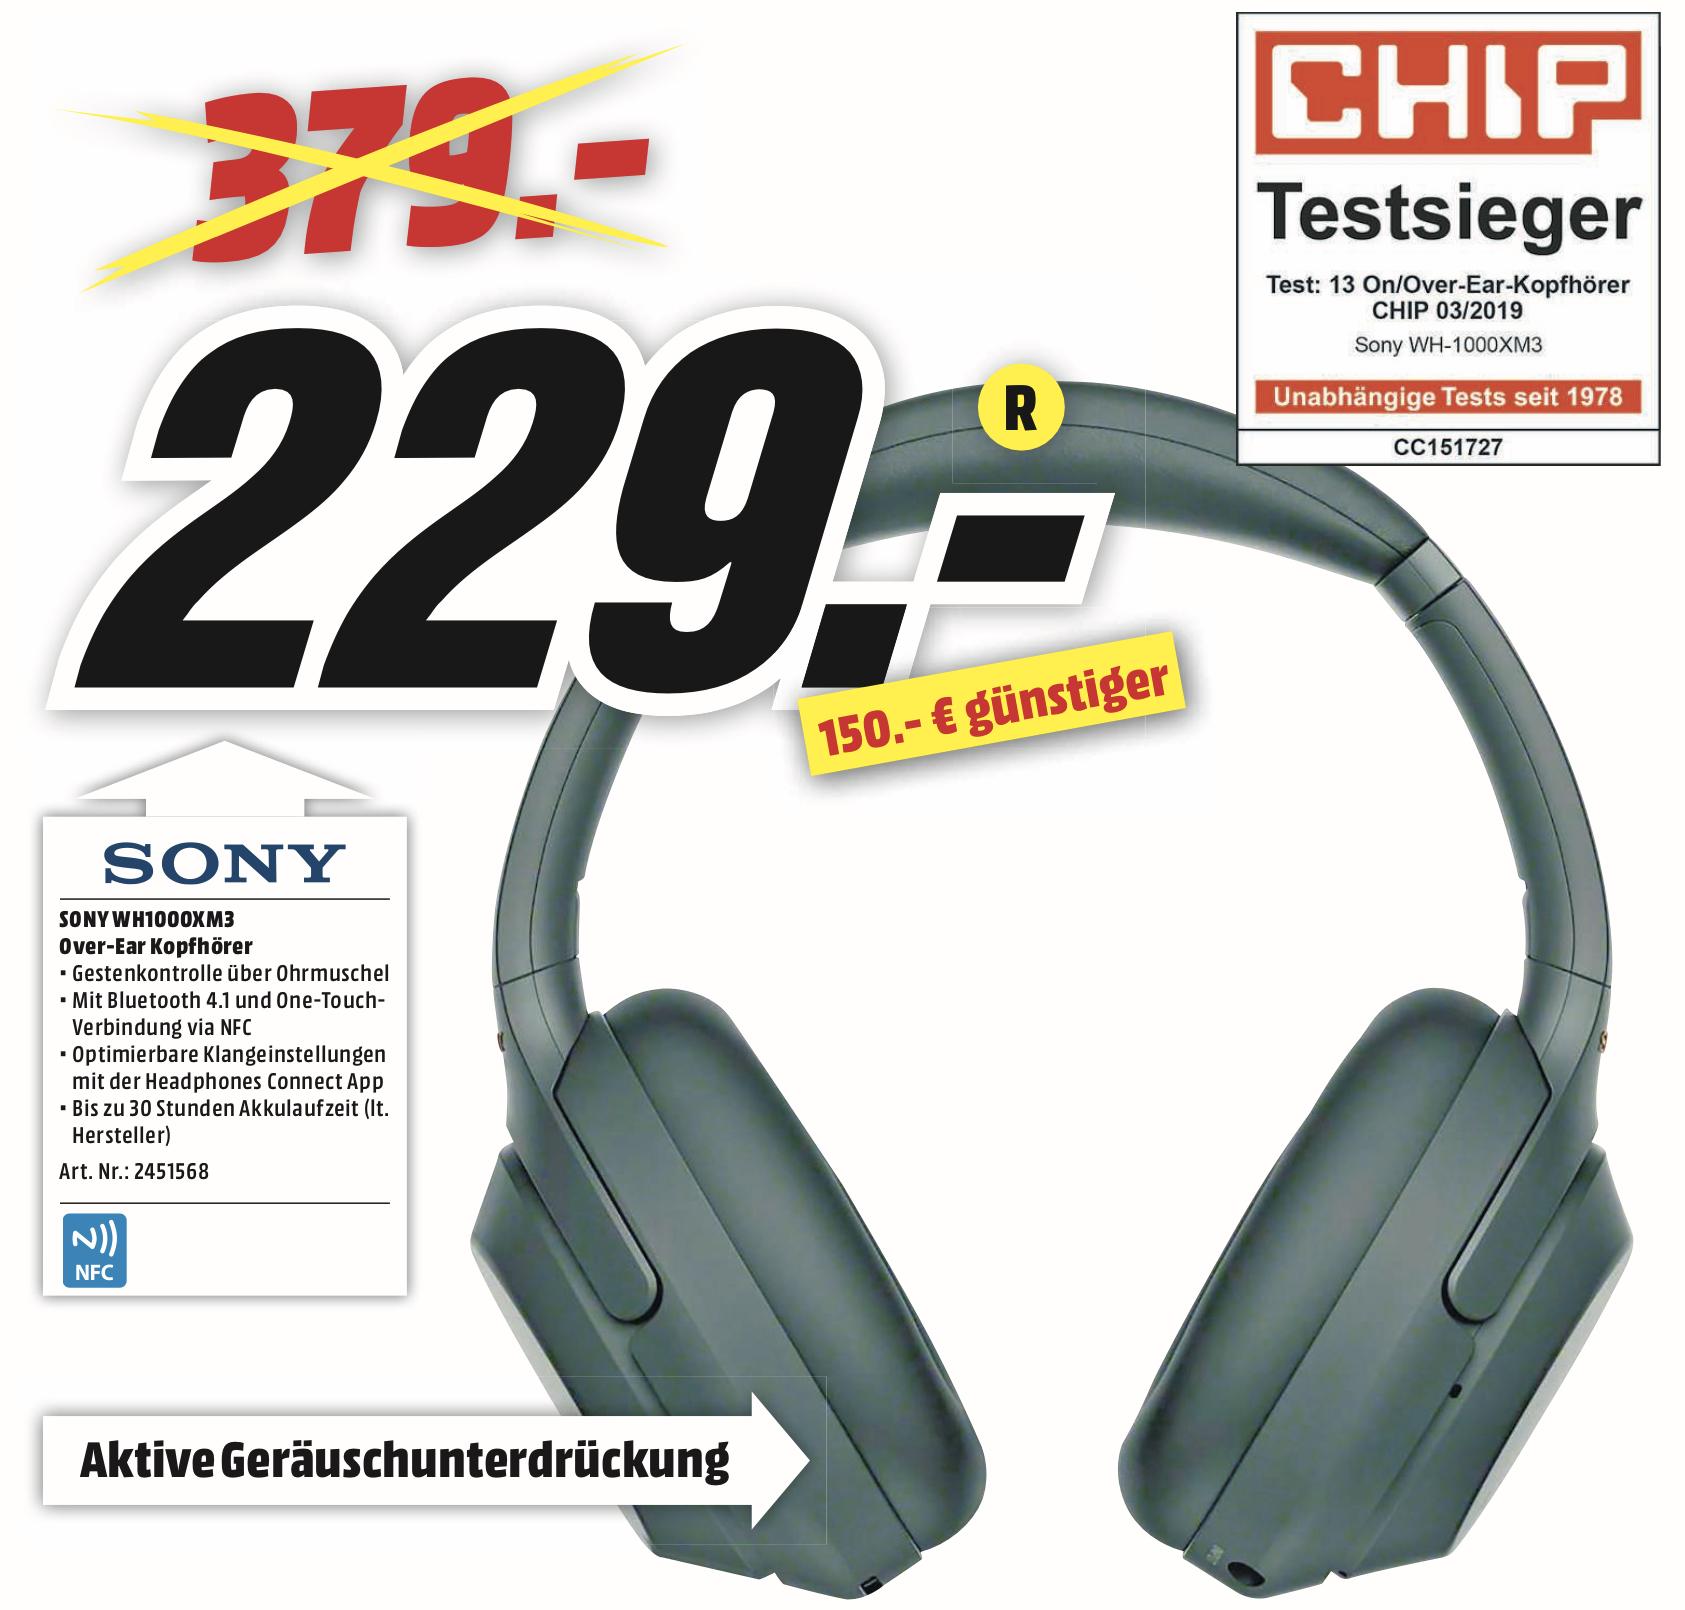 Lokal MediaMarkt Bochum u. Castrop-Rauxel: Sony WH-1000XM3 Kopfhörer für 229€